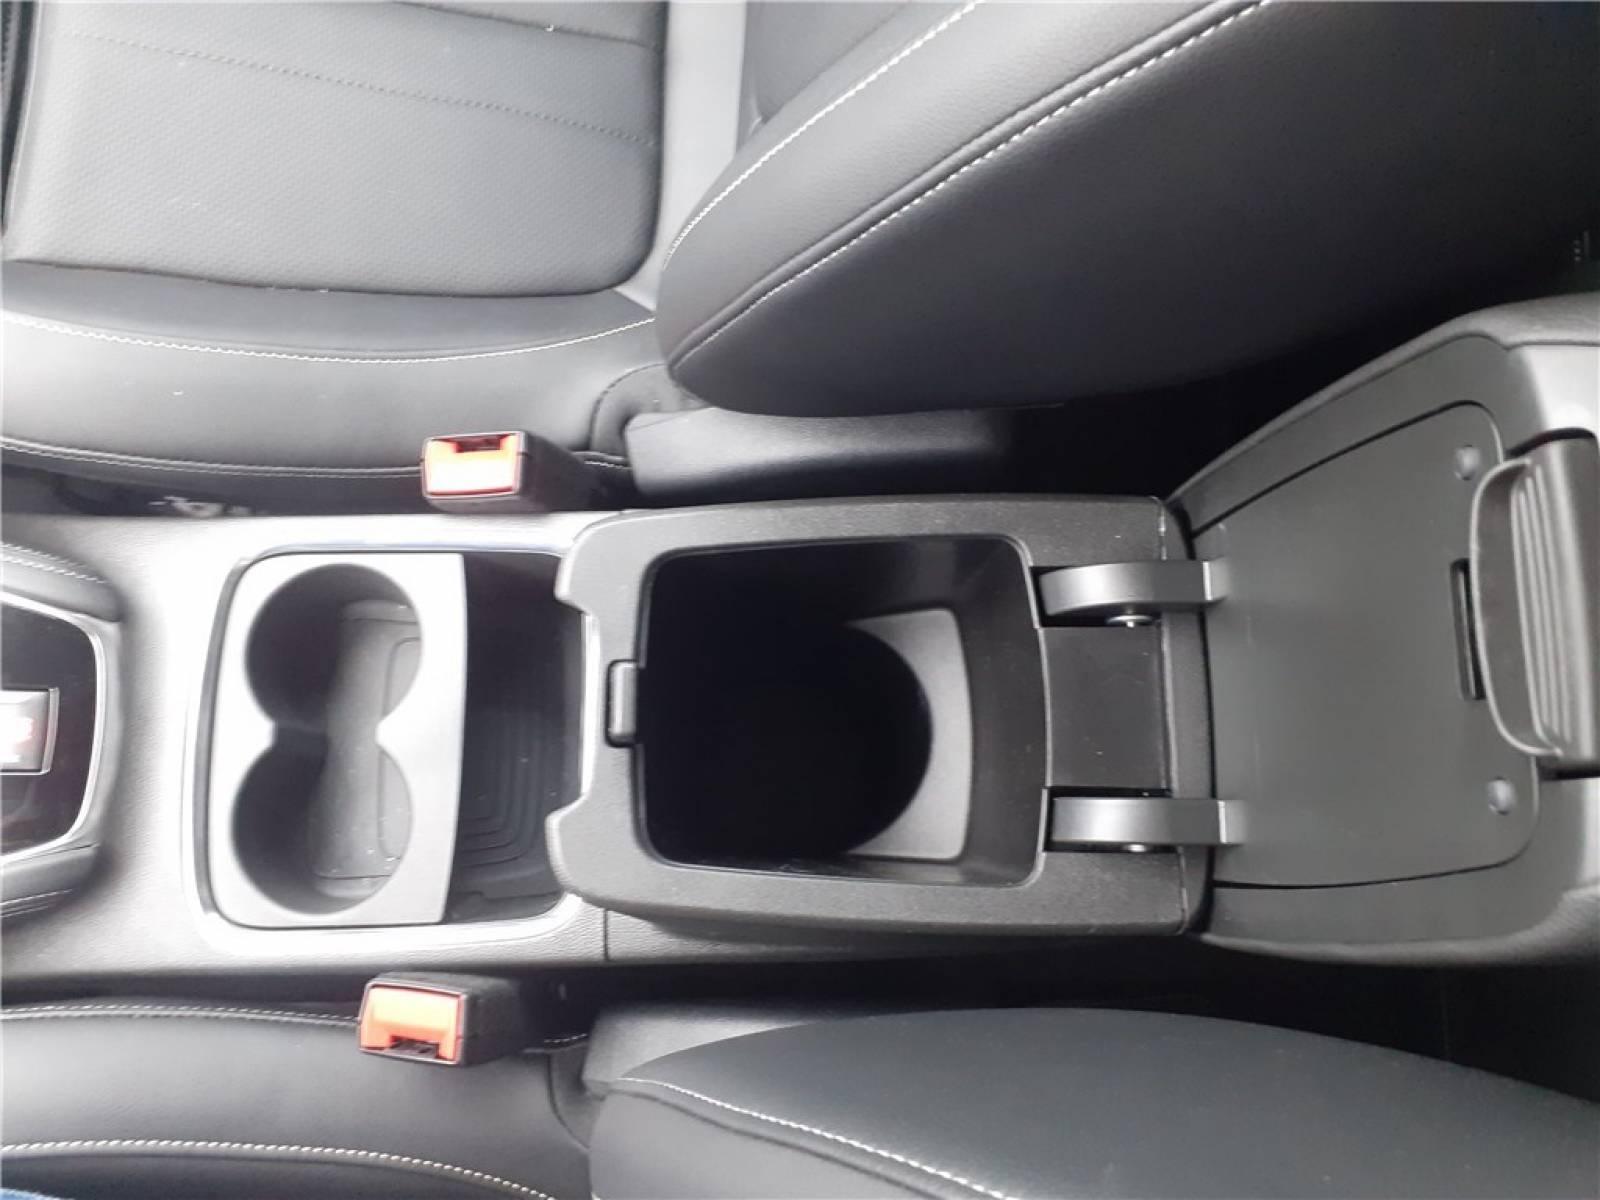 OPEL Grandland X Hybrid 225 ch BVA8 - véhicule d'occasion - Groupe Guillet - Opel Magicauto - Chalon-sur-Saône - 71380 - Saint-Marcel - 53